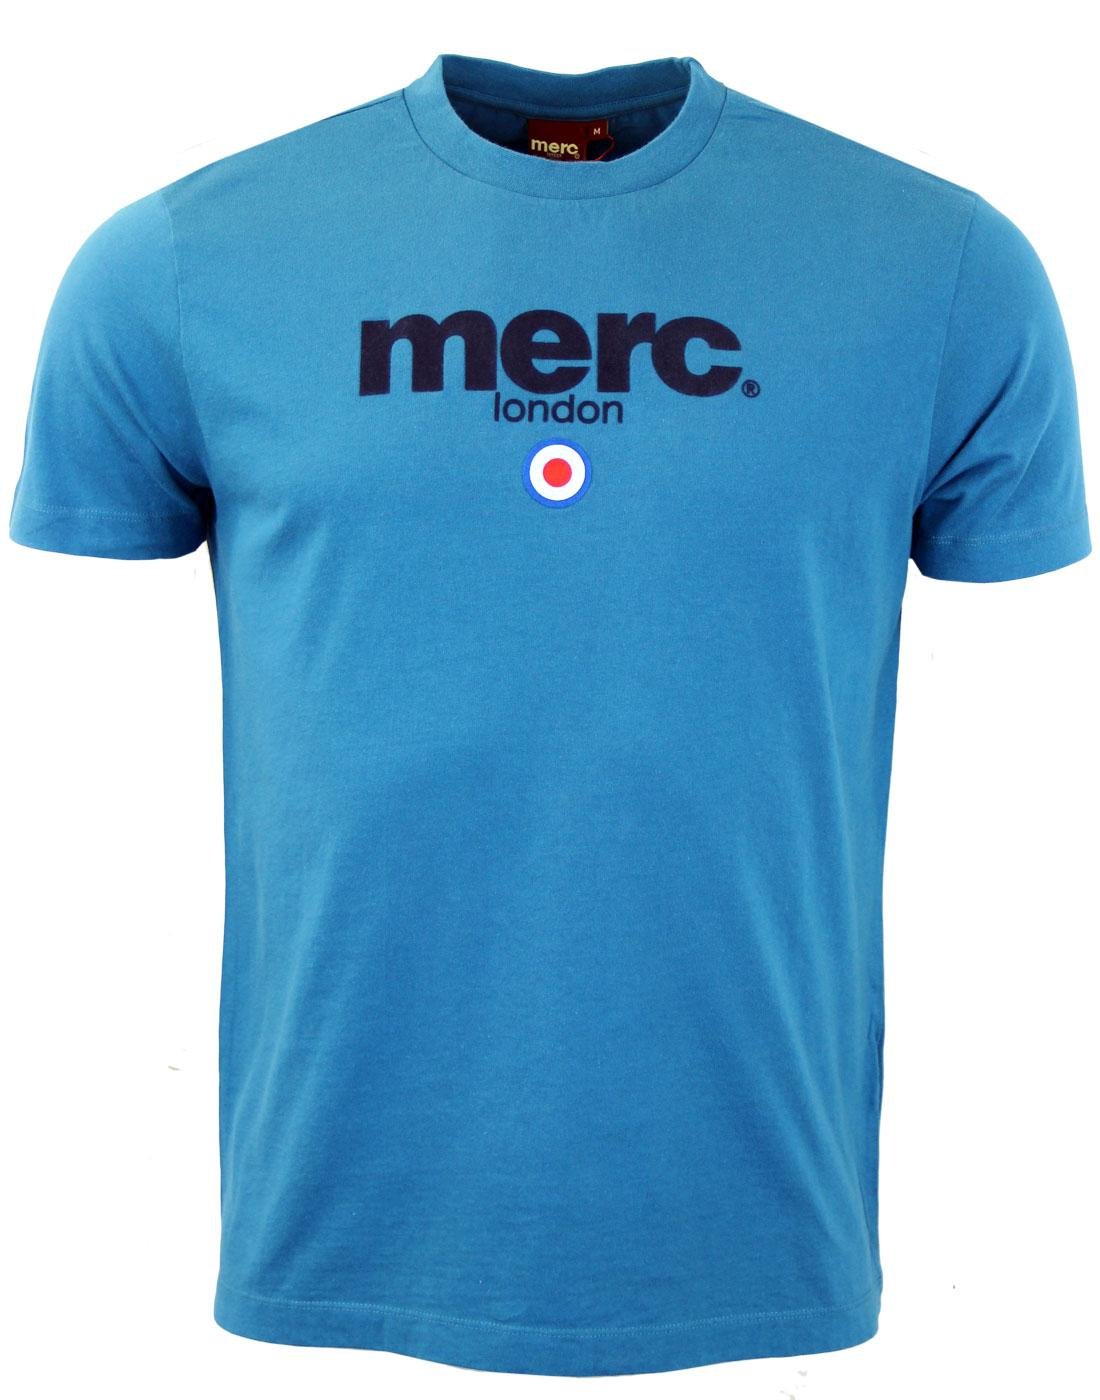 Merc brighton retro mod target signature t shirt for Brighton t shirt printing